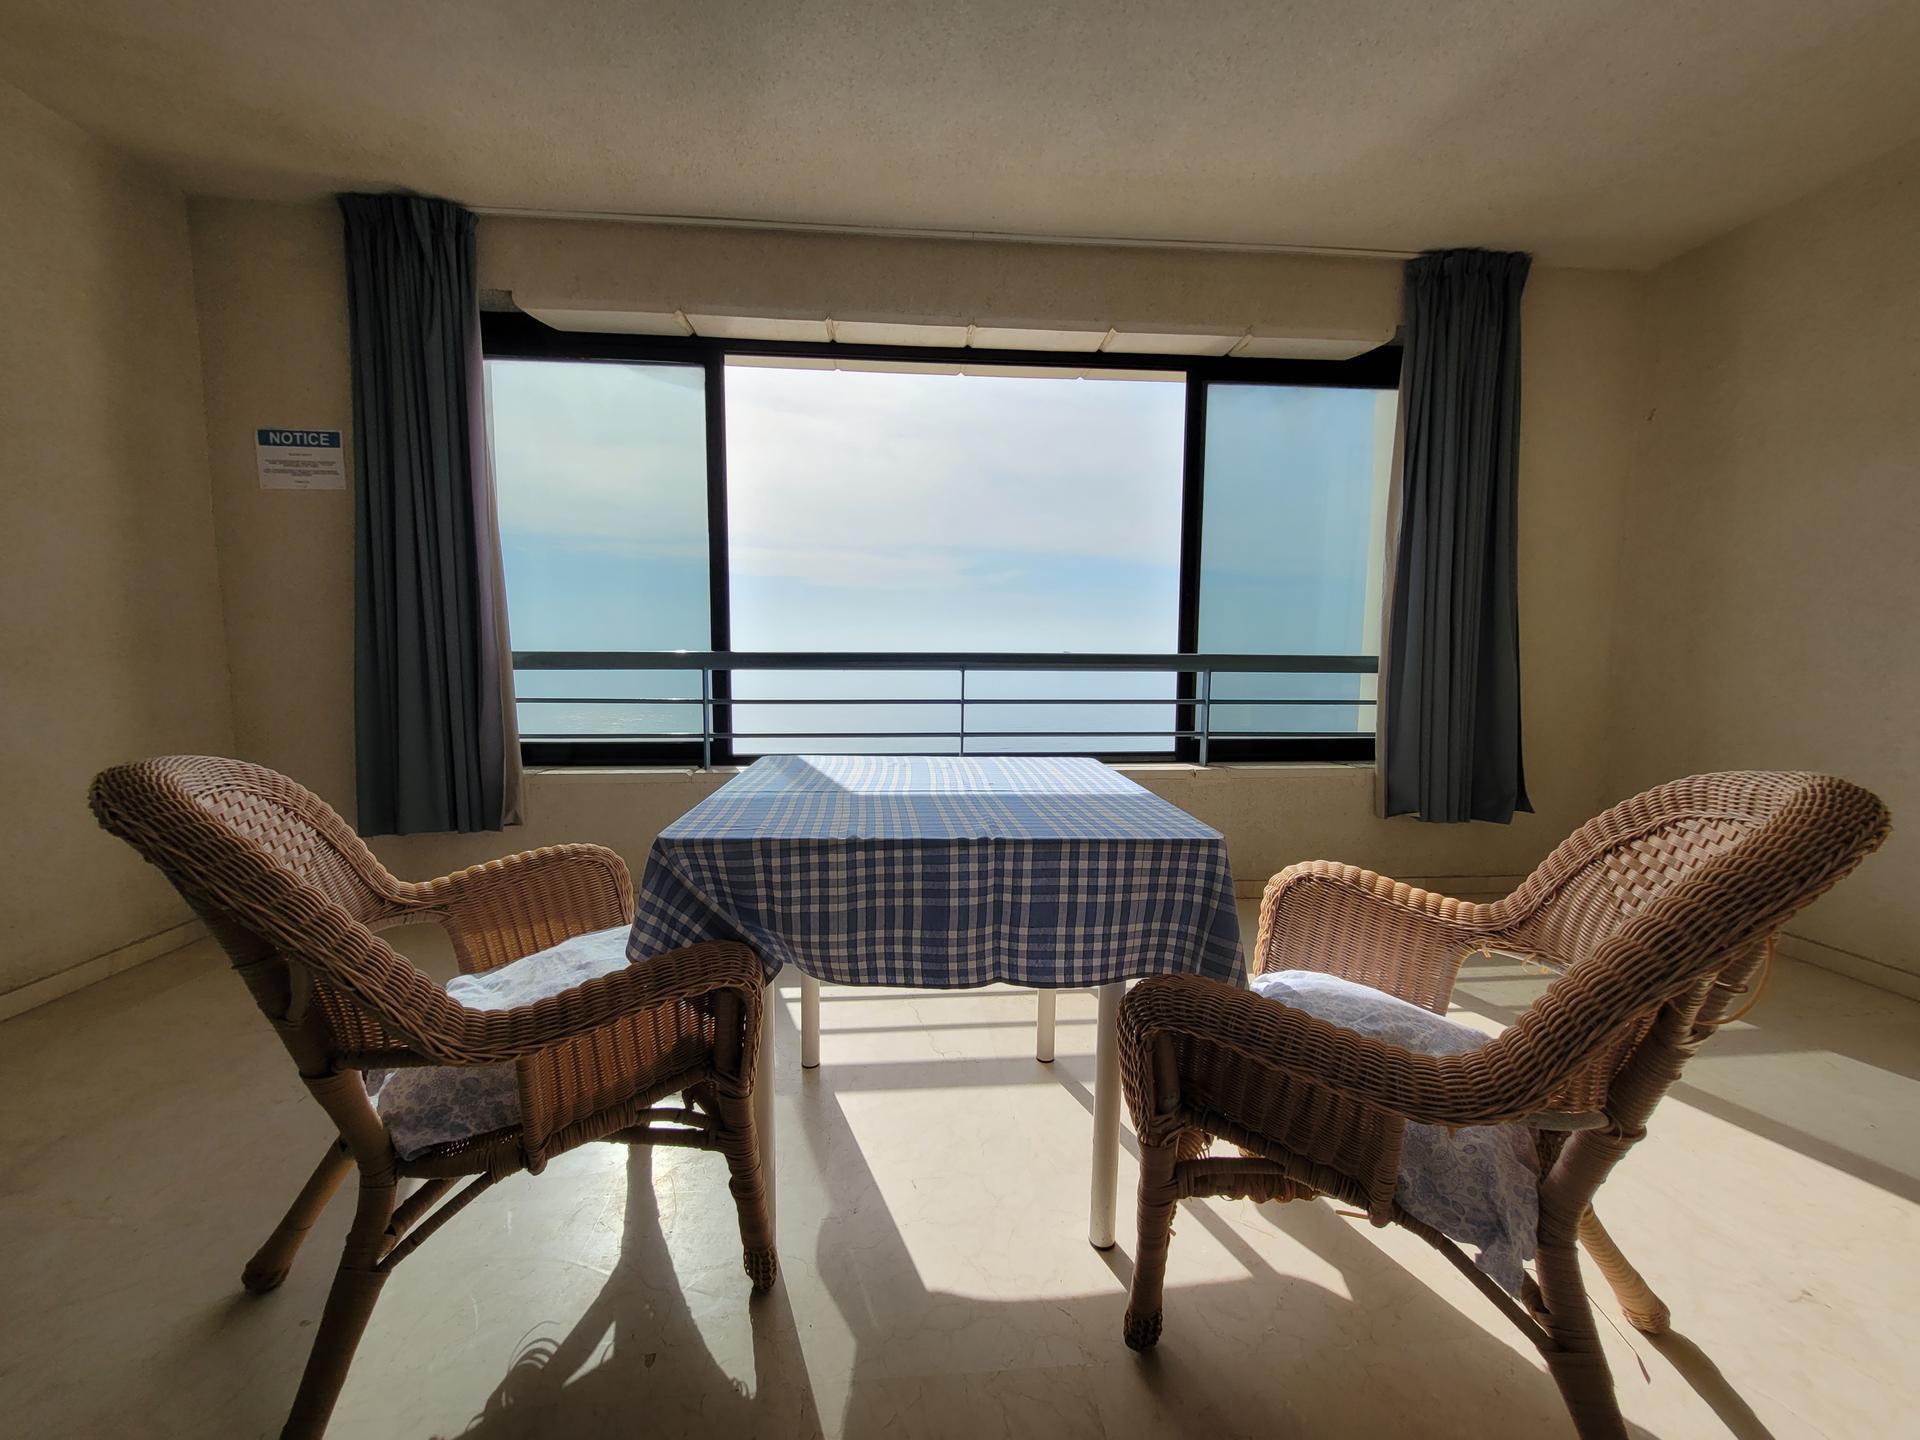 Apartamento -                                       Benidorm -                                       1 dormitorios -                                       4 ocupantes